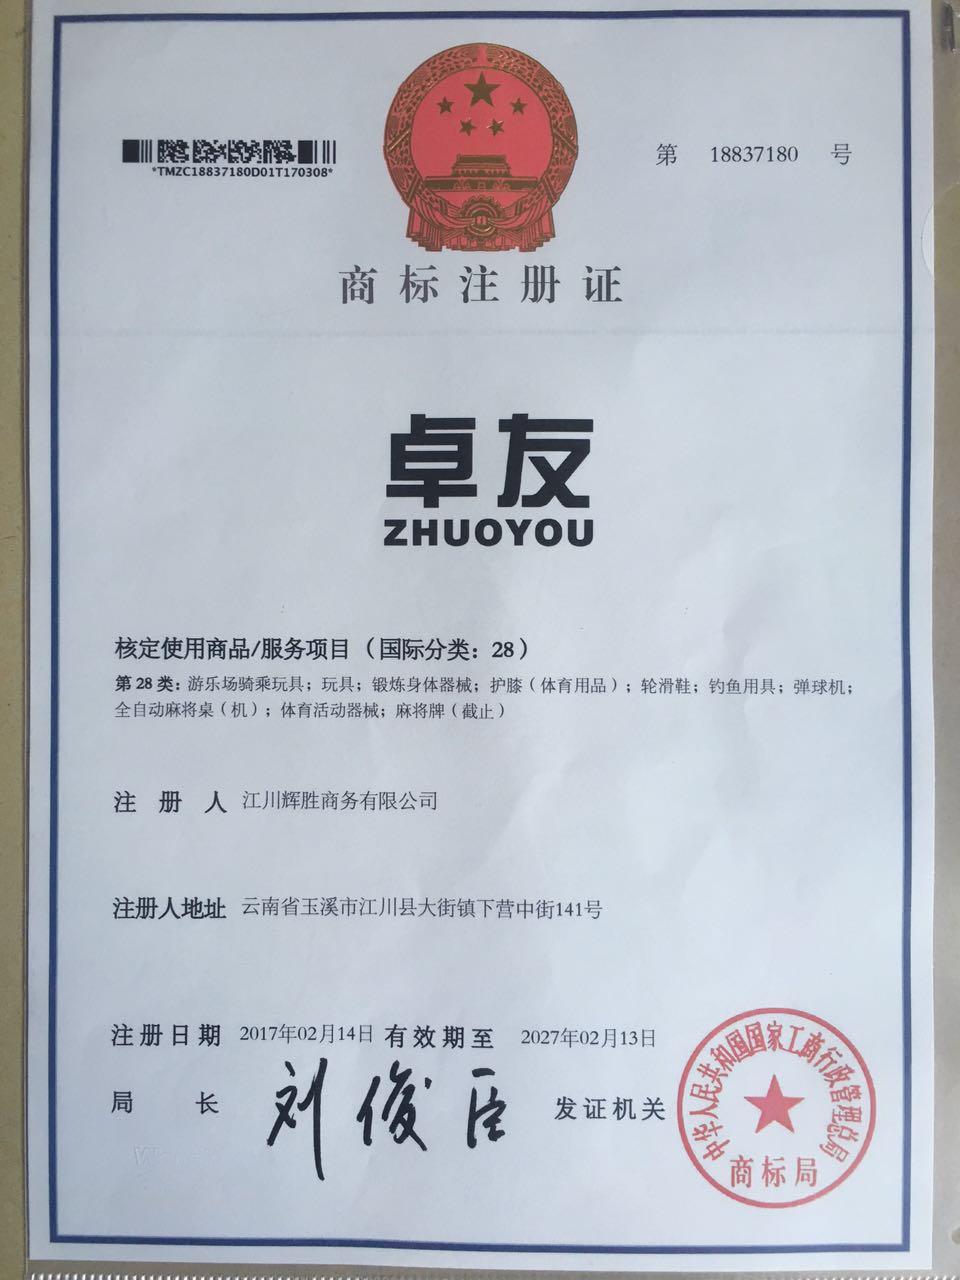 卓友(ZHUOYOU)